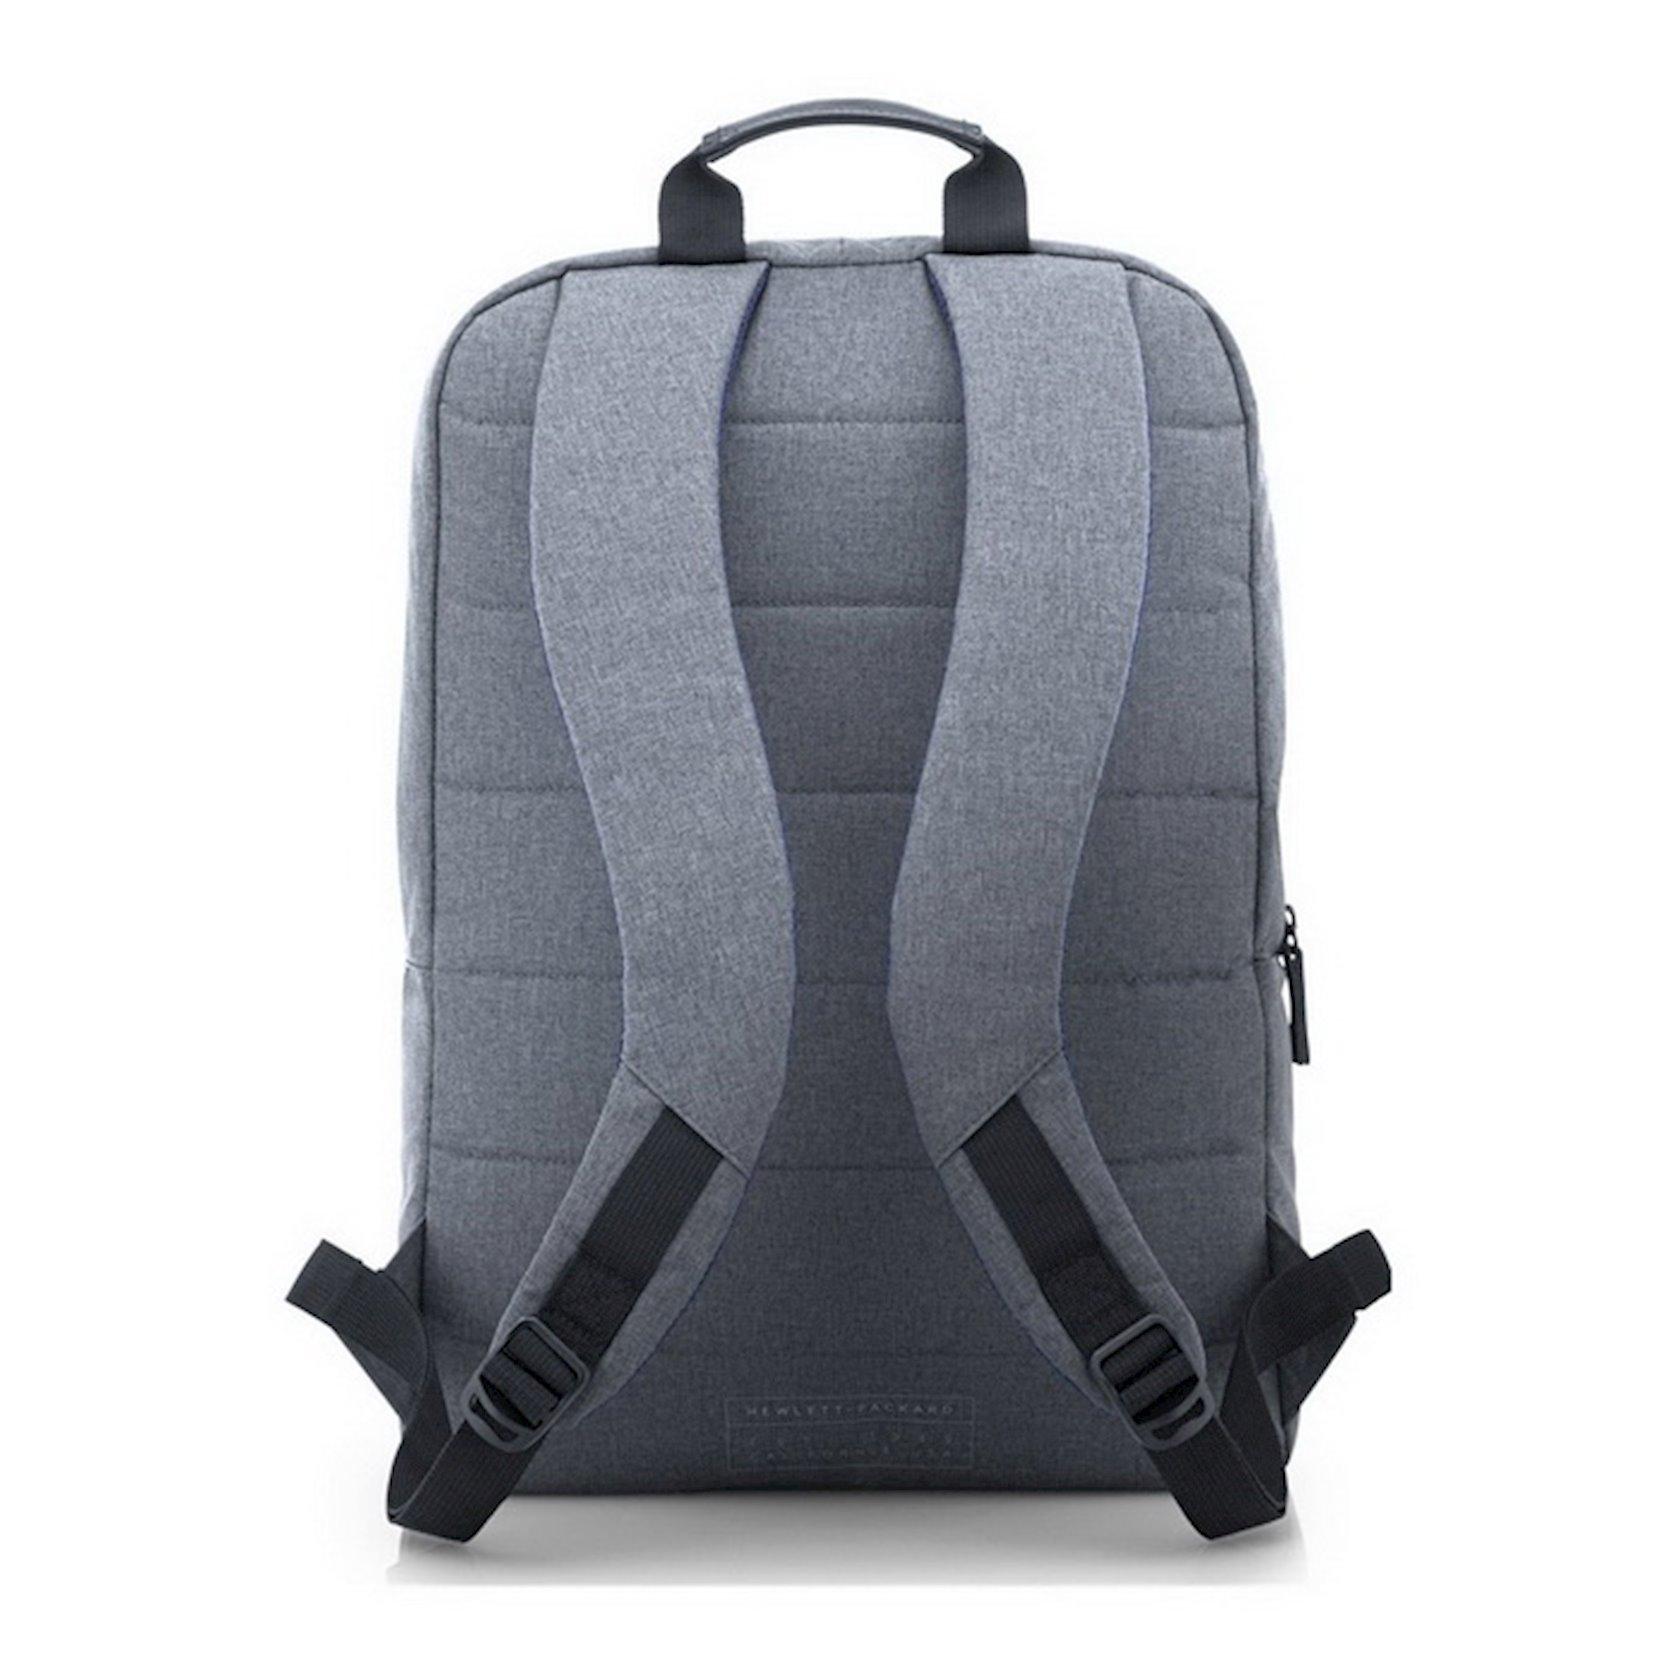 Noutbuk üçün bel çantası  HP Value Backpack 15.6 (K0B39AA)